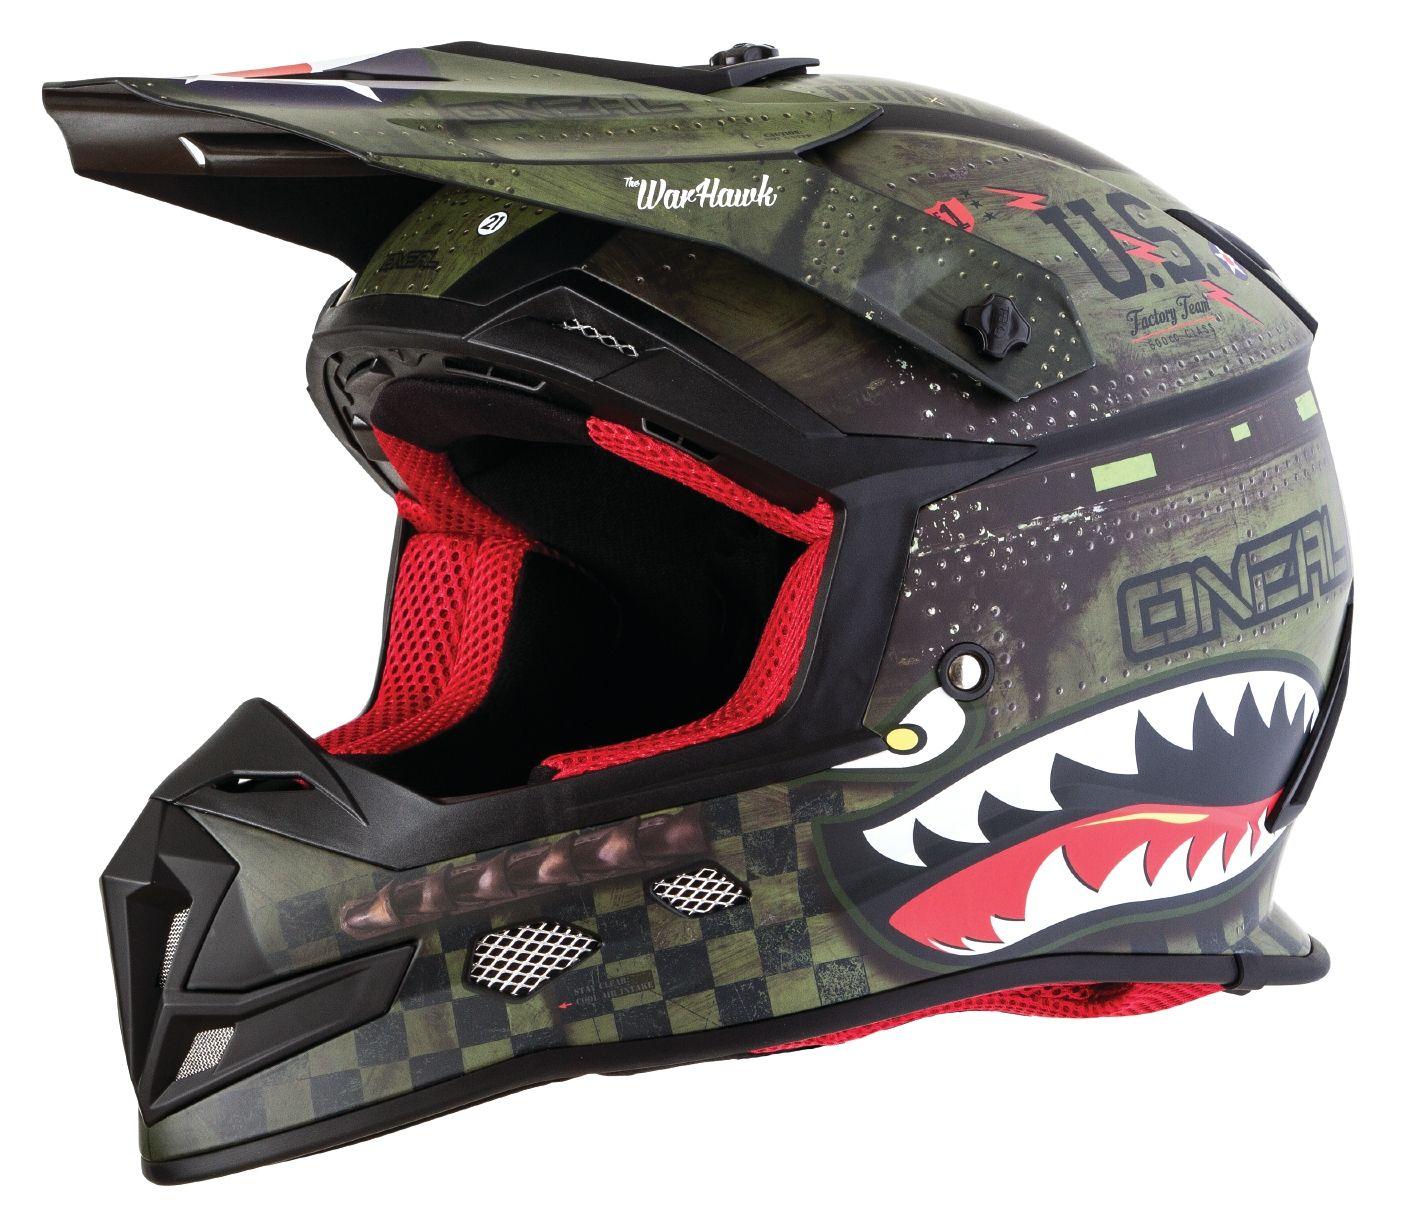 Airoh Twist Helmet A Lightweight Aggressively Styled Off Road Helmet Form Airoh The Twist Is A New Thermoplastic Hel With Images Motorcross Helmet Black Helmet Helmet